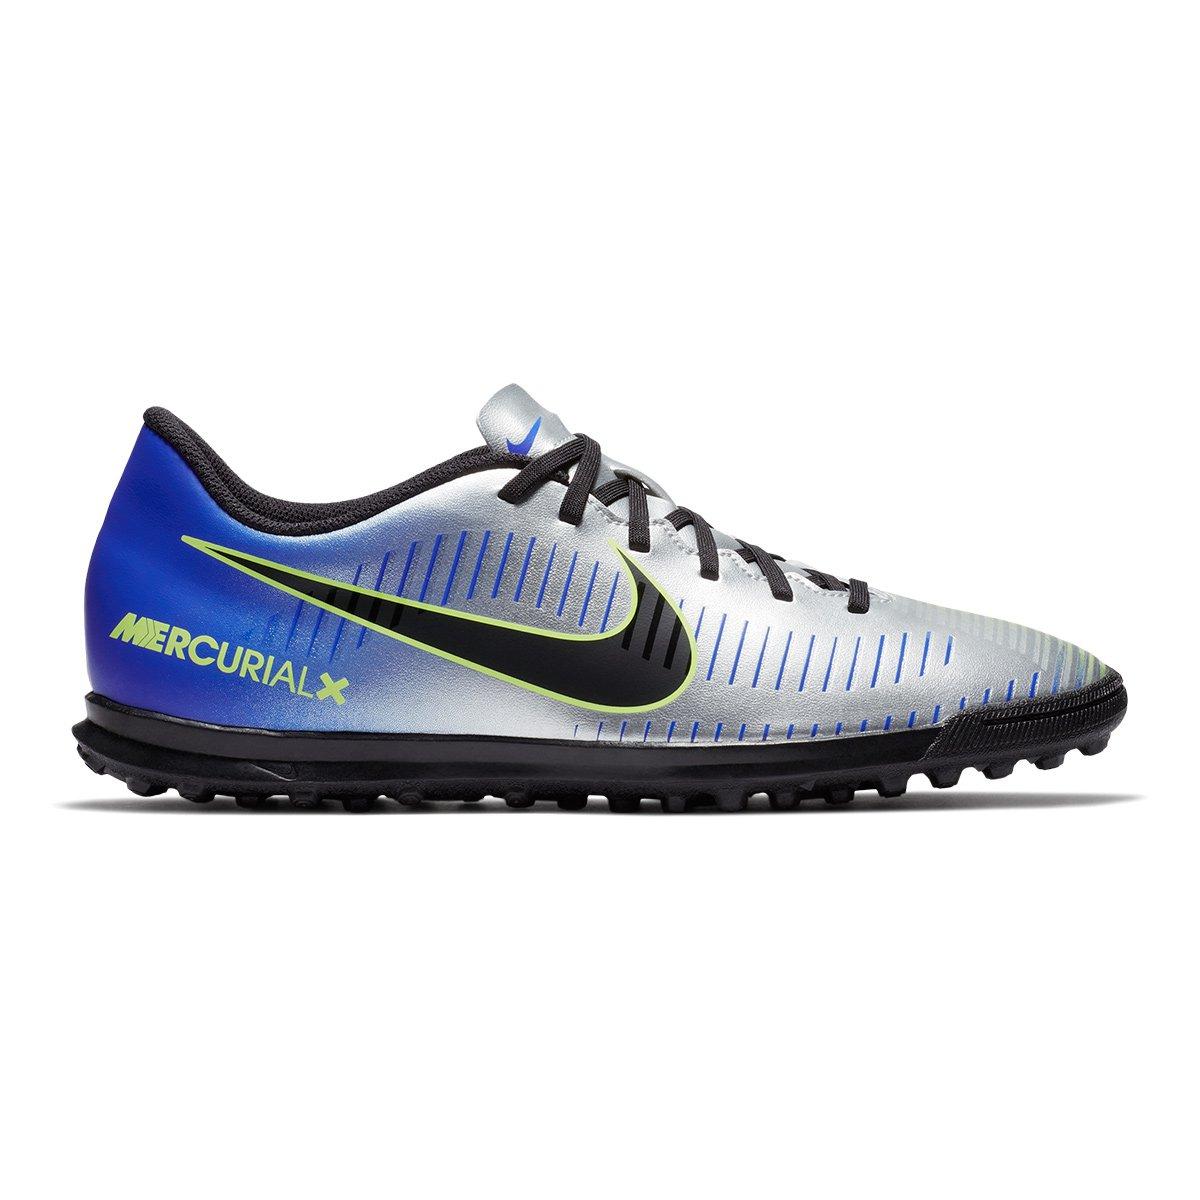 c585b25f16 Chuteira Society Nike Mercurial Vortex 3 Neymar Jr TF - Azul e Preto ...